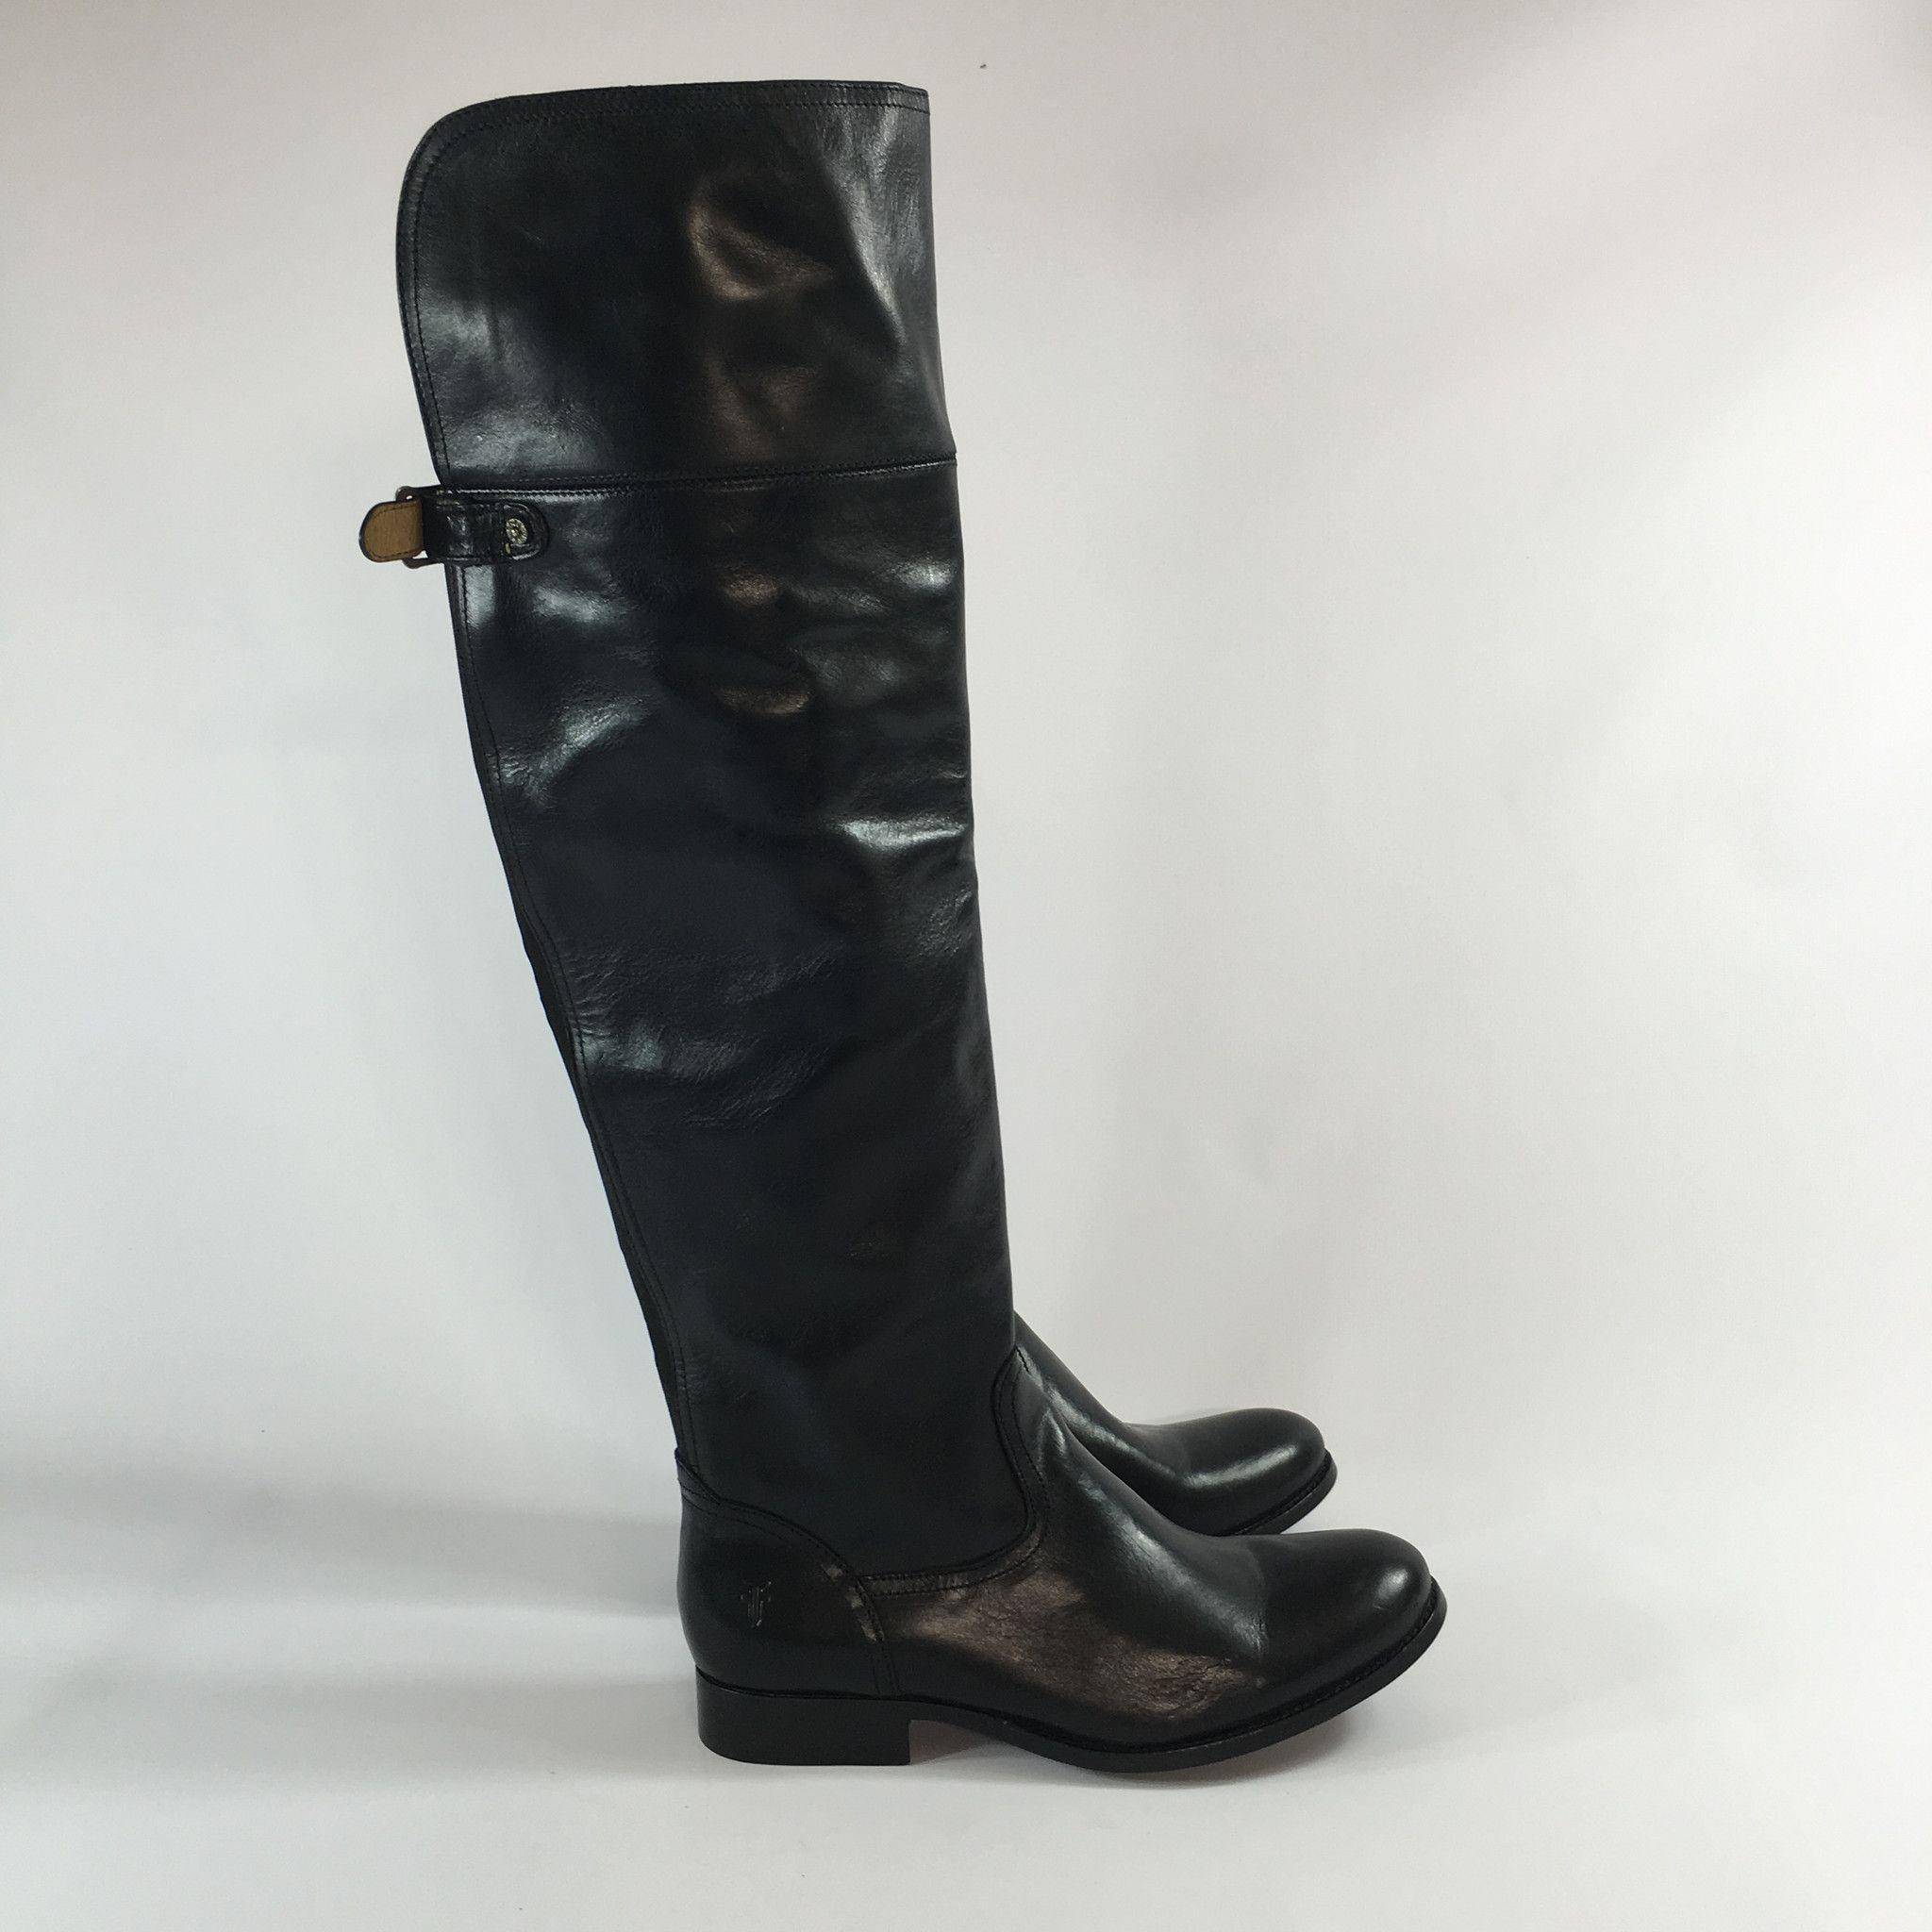 d33e76bd841 Frye Melissa OTK Over The Knee Boot Black Size 9